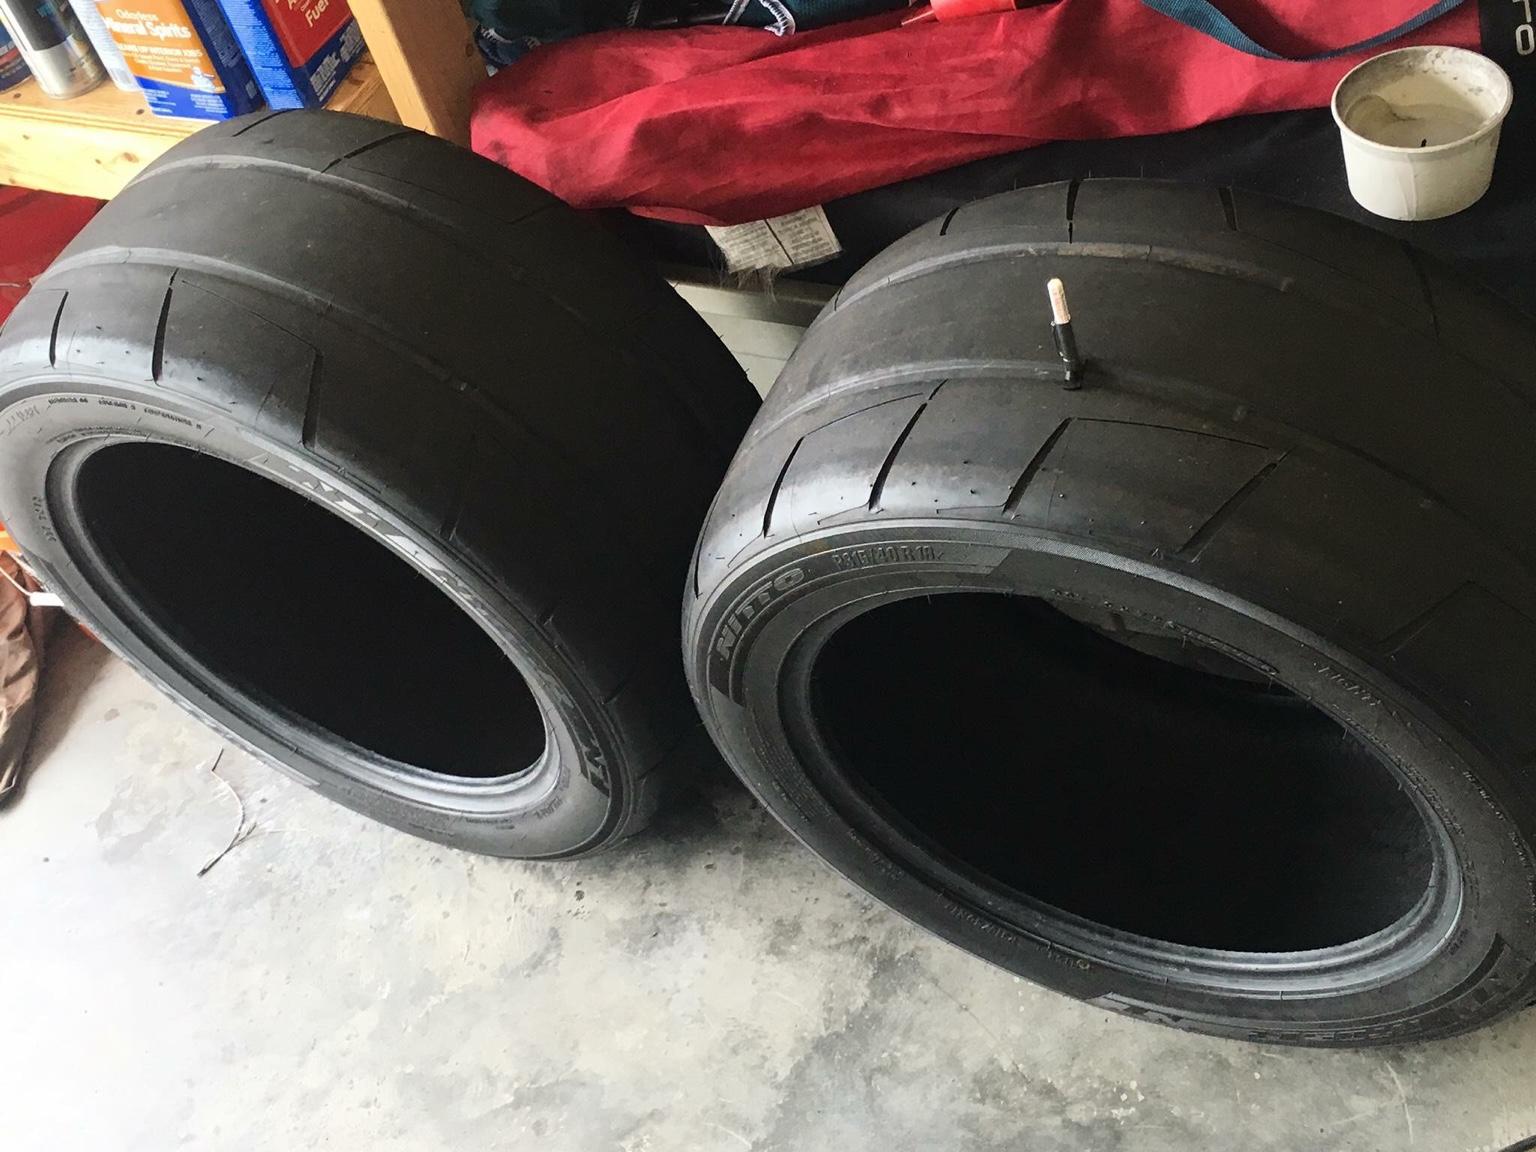 Used Tires Savannah Ga >> [For Sale] 315/40/18 NT05R drag radials - Nissan 370Z Forum